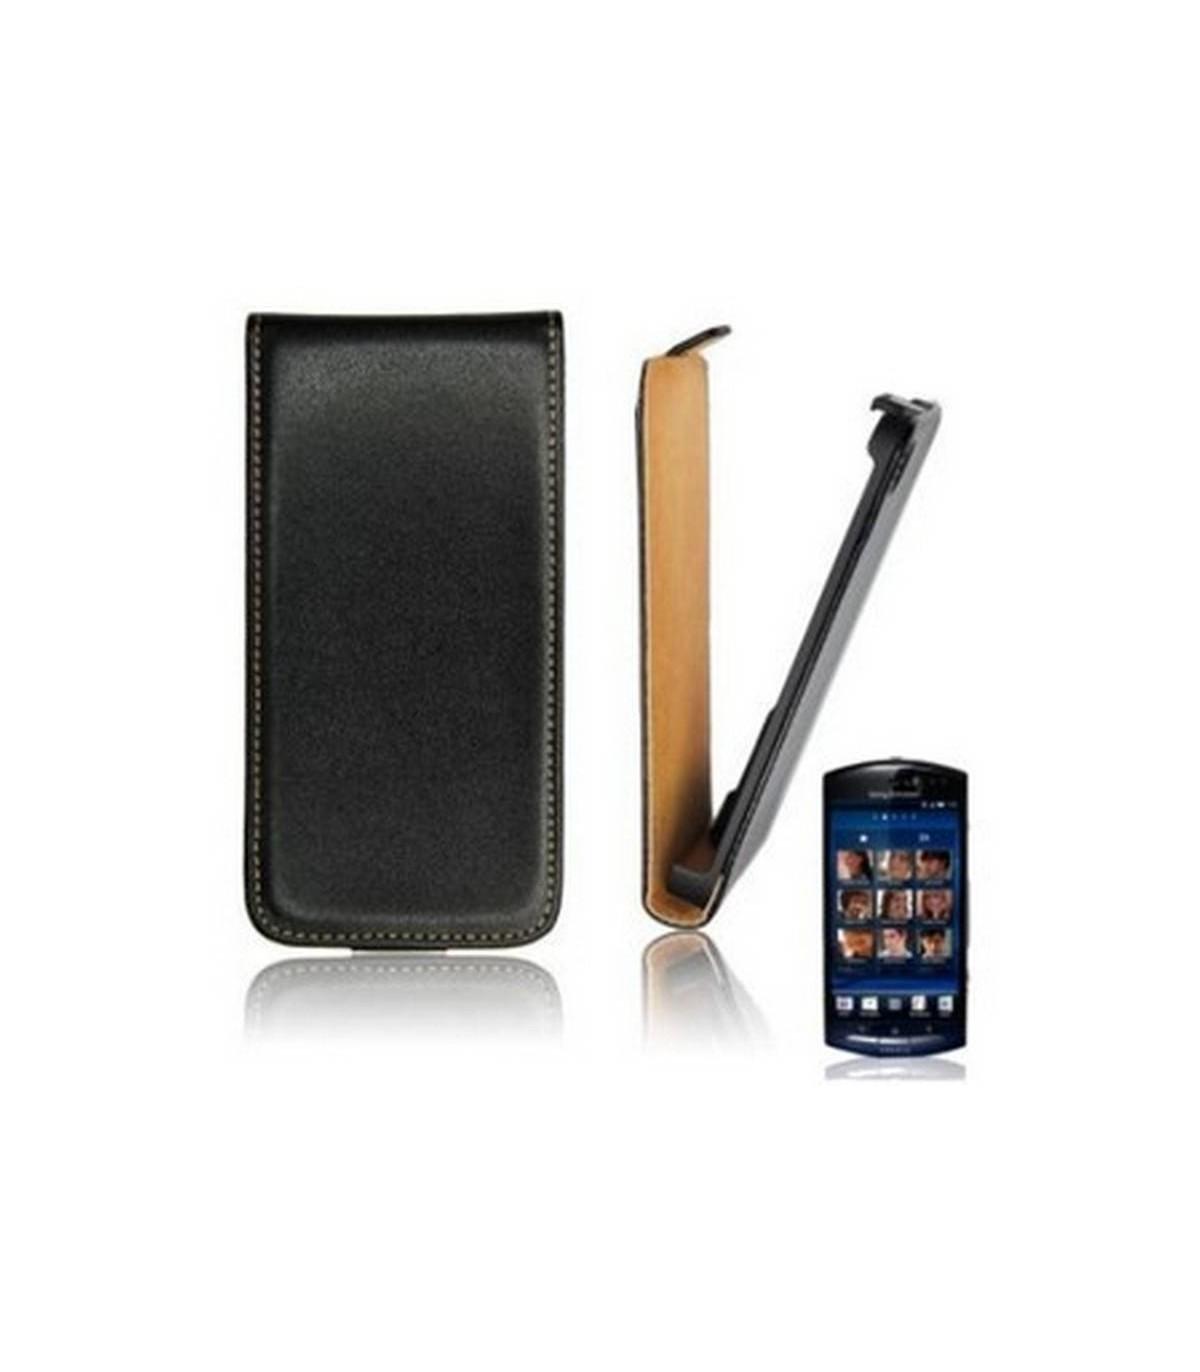 Funda PIEL leather SLIM para Sony Ericsson Xperia Neo MT15i, Neo V MT11i